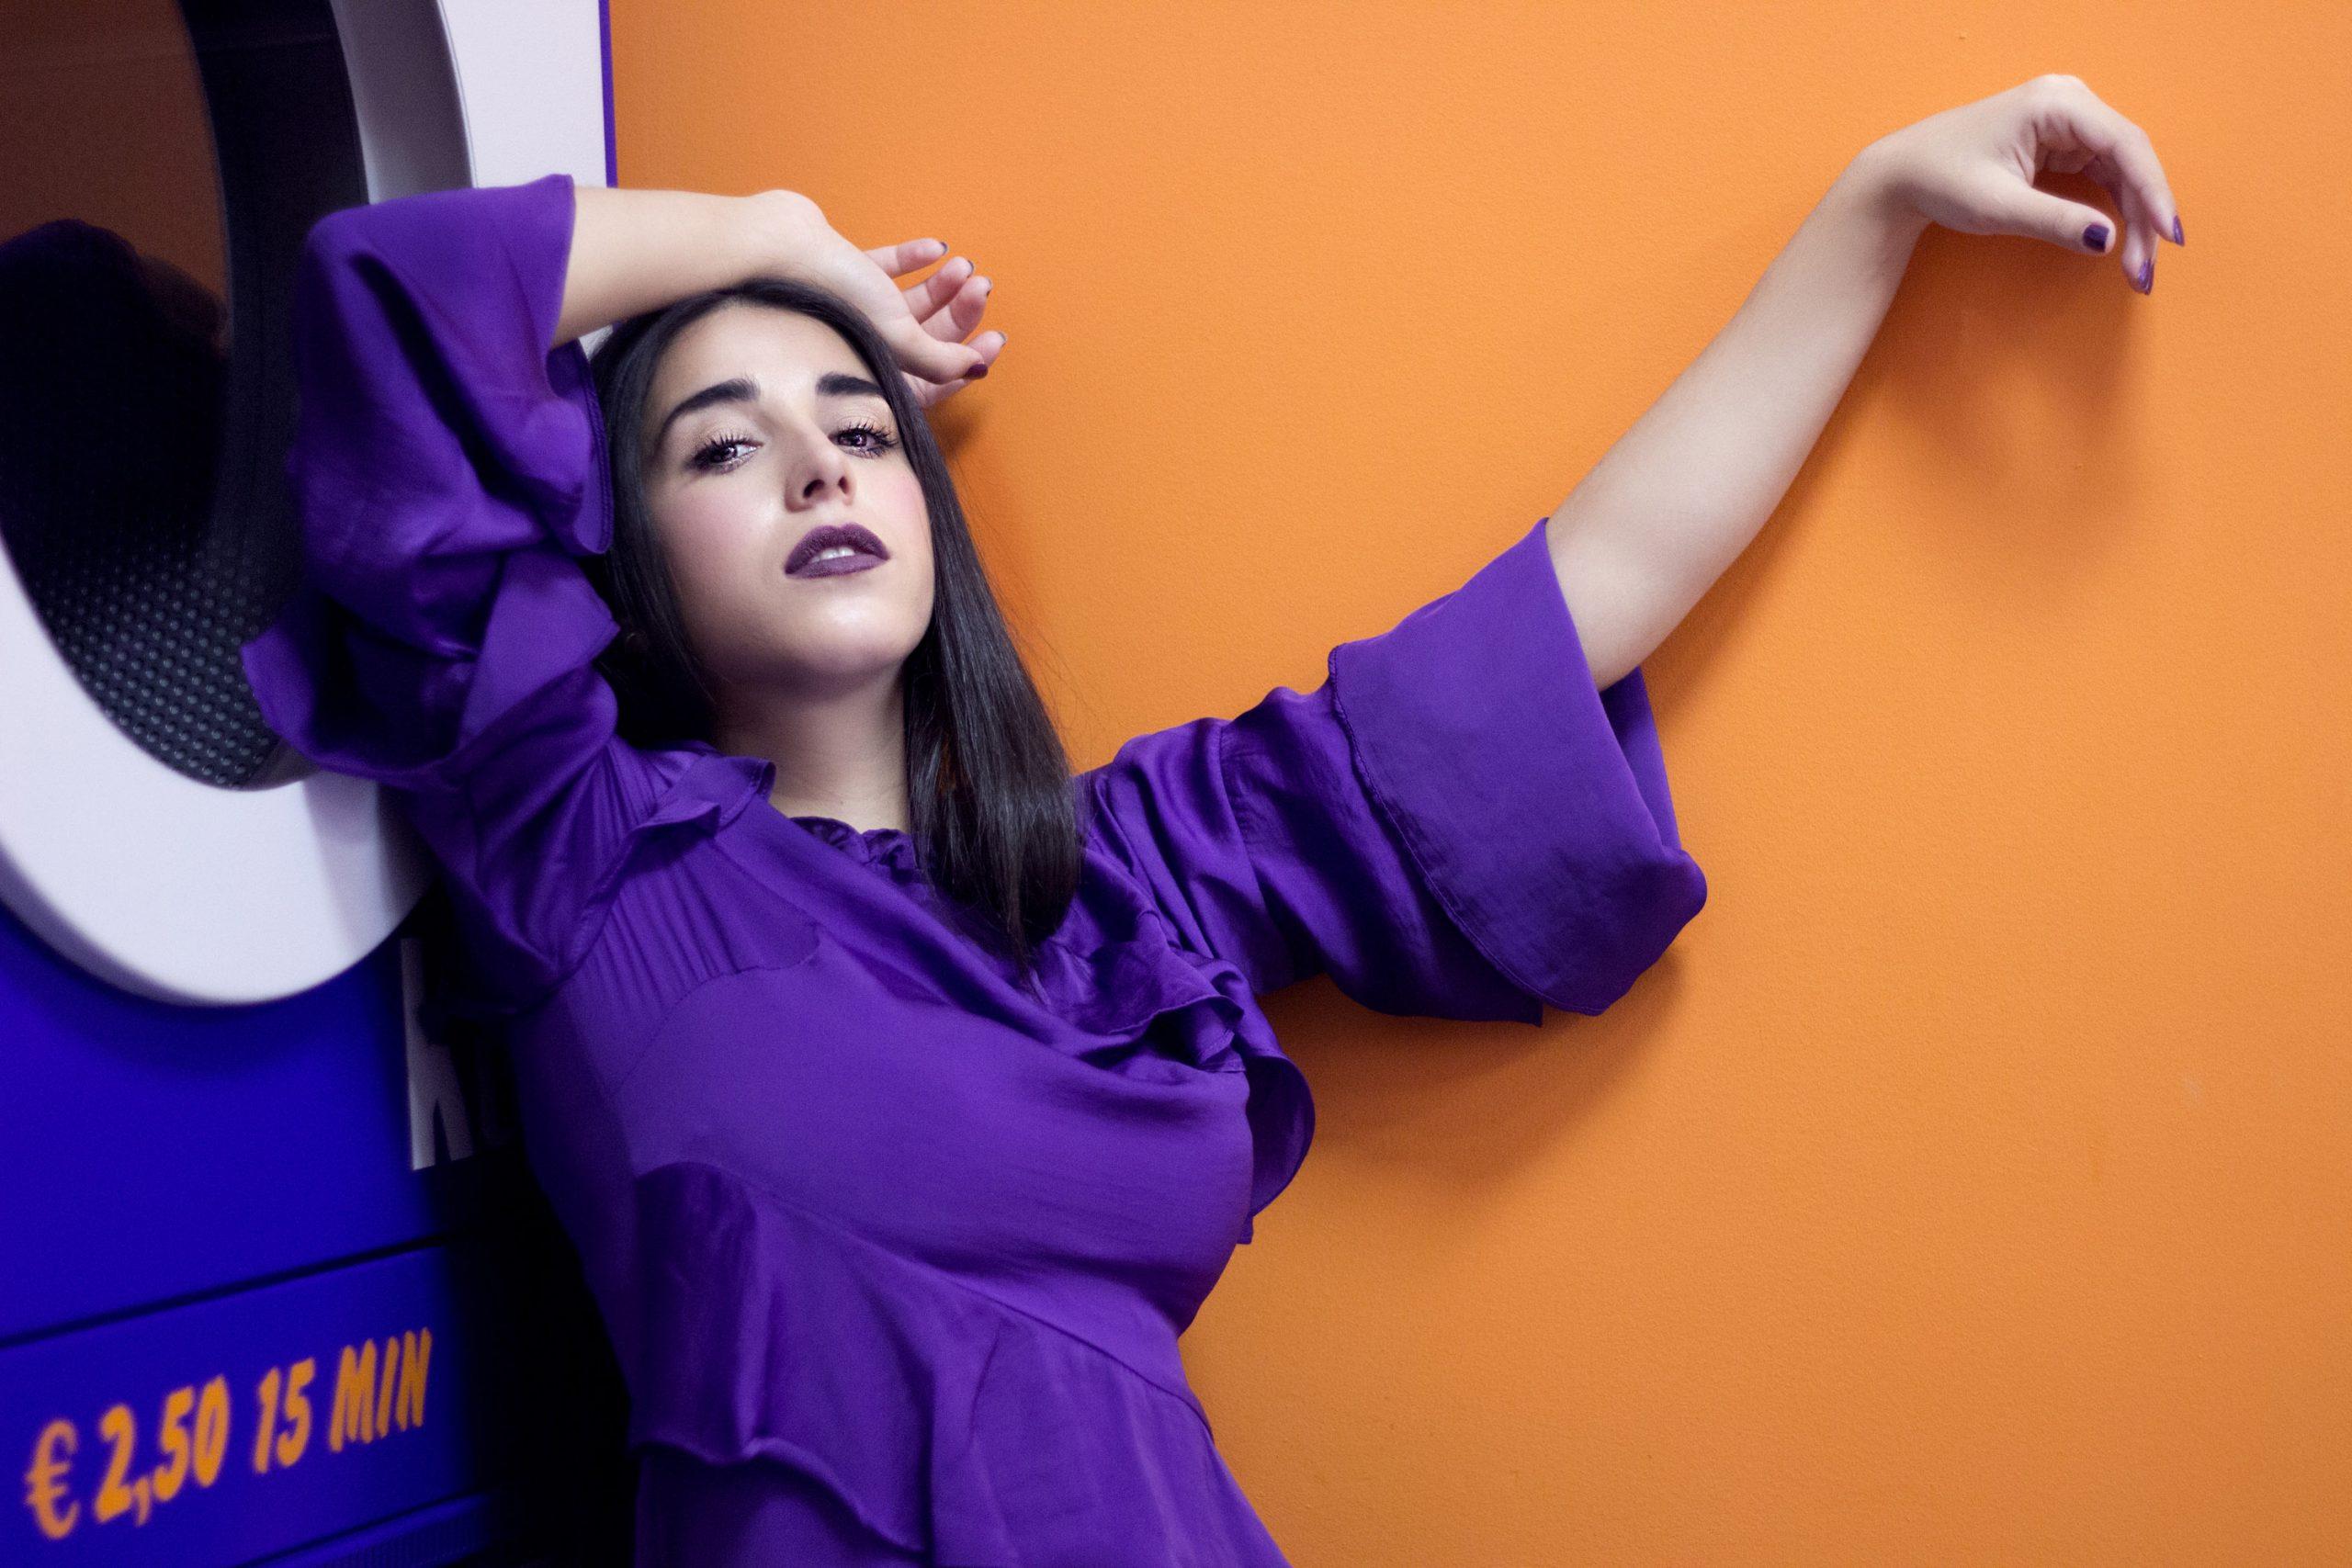 Categorie: Fashion, Glamour, Portrait; Ph, Stylist & Mua: MARINÙ NISTA; Model: GIULIA TASSONE; Location: Bologna, BO, Italia